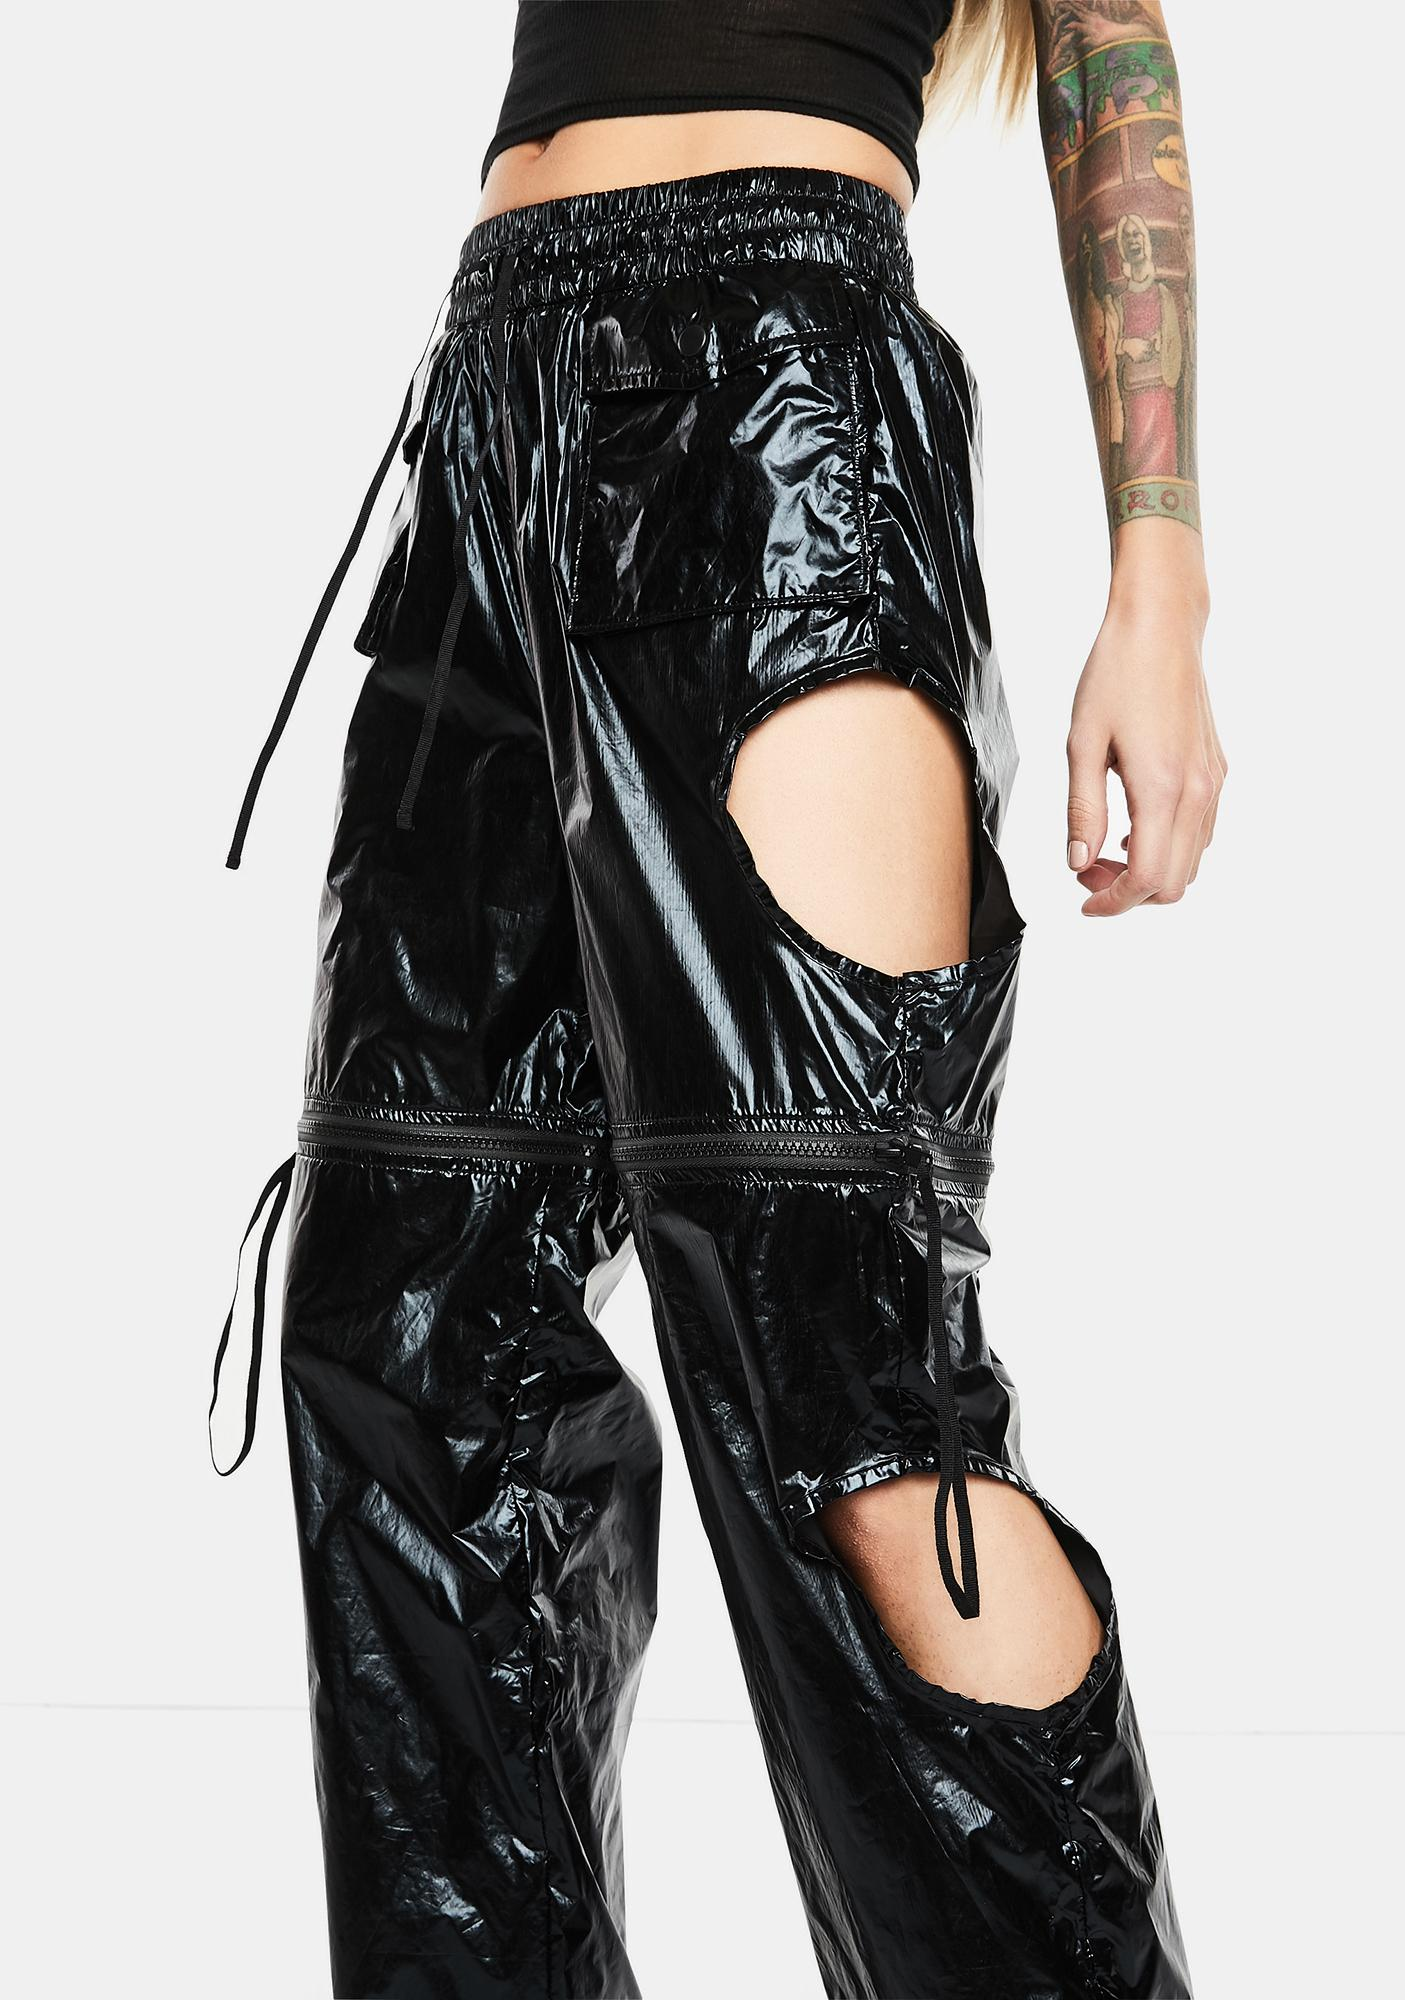 Club Exx Zero Gravity Convertible Cutout Pants